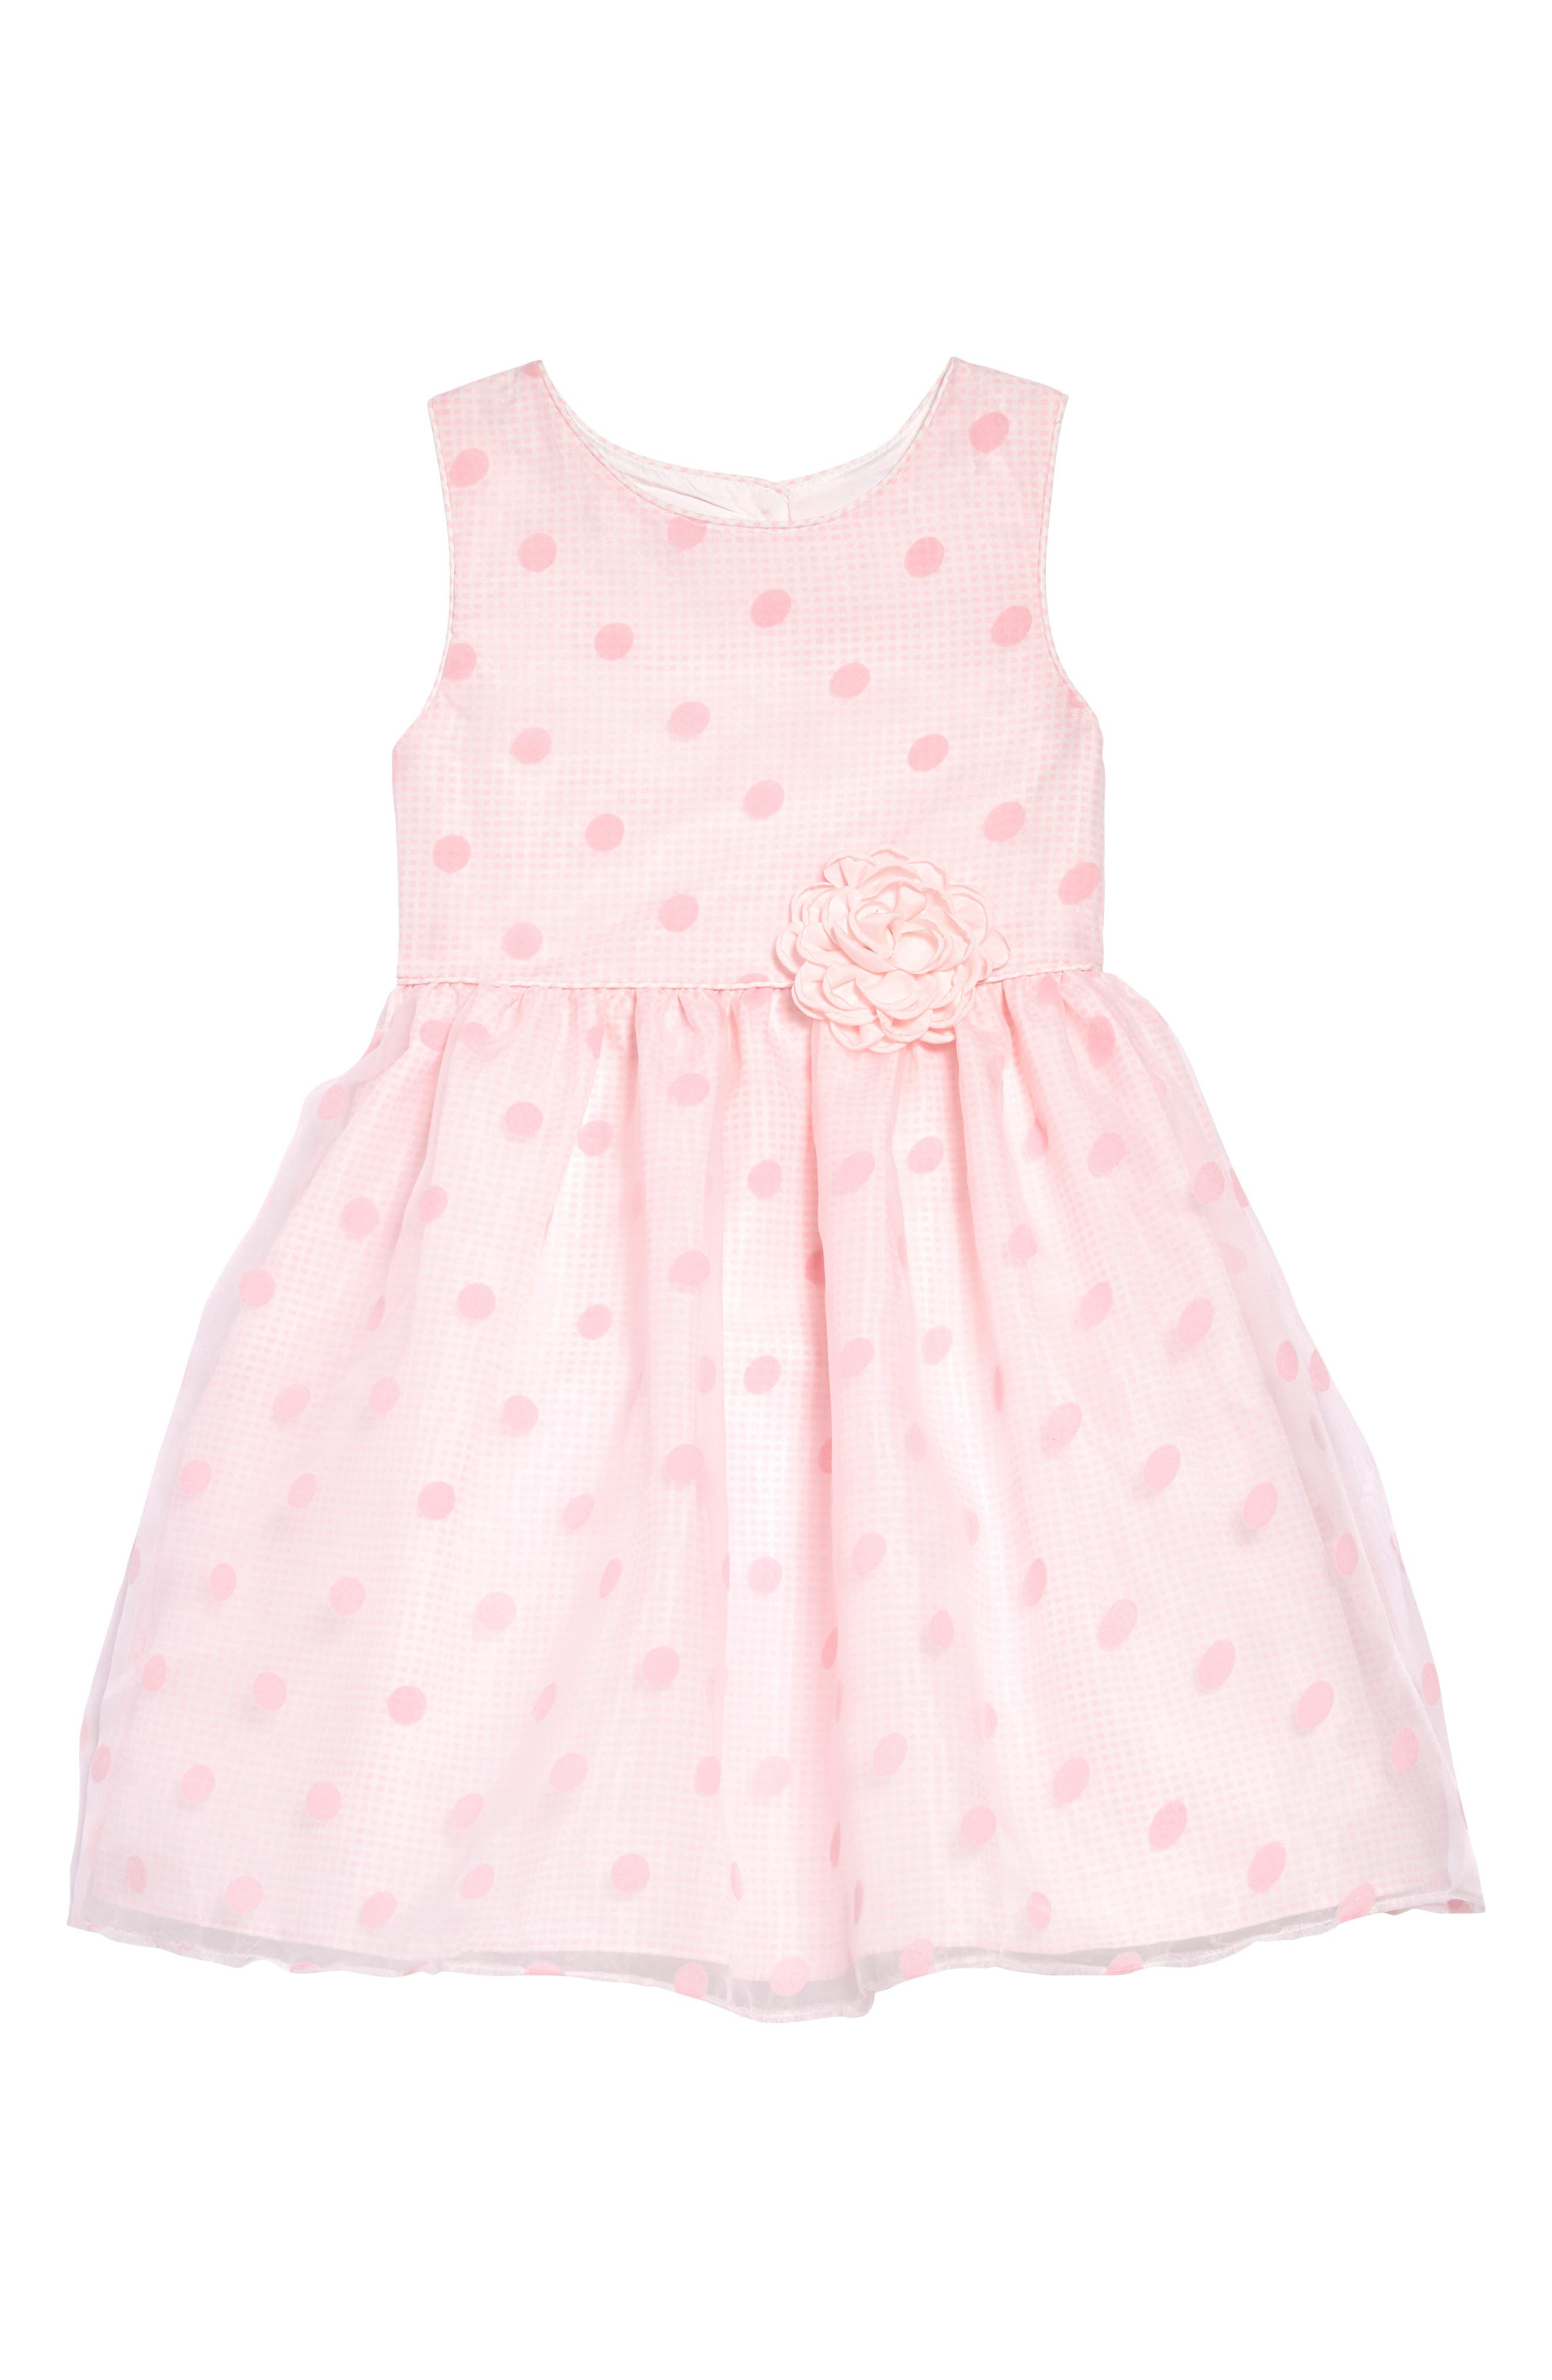 FRAIS, Dot Overlay Gingham Dress, Main thumbnail 1, color, PINK